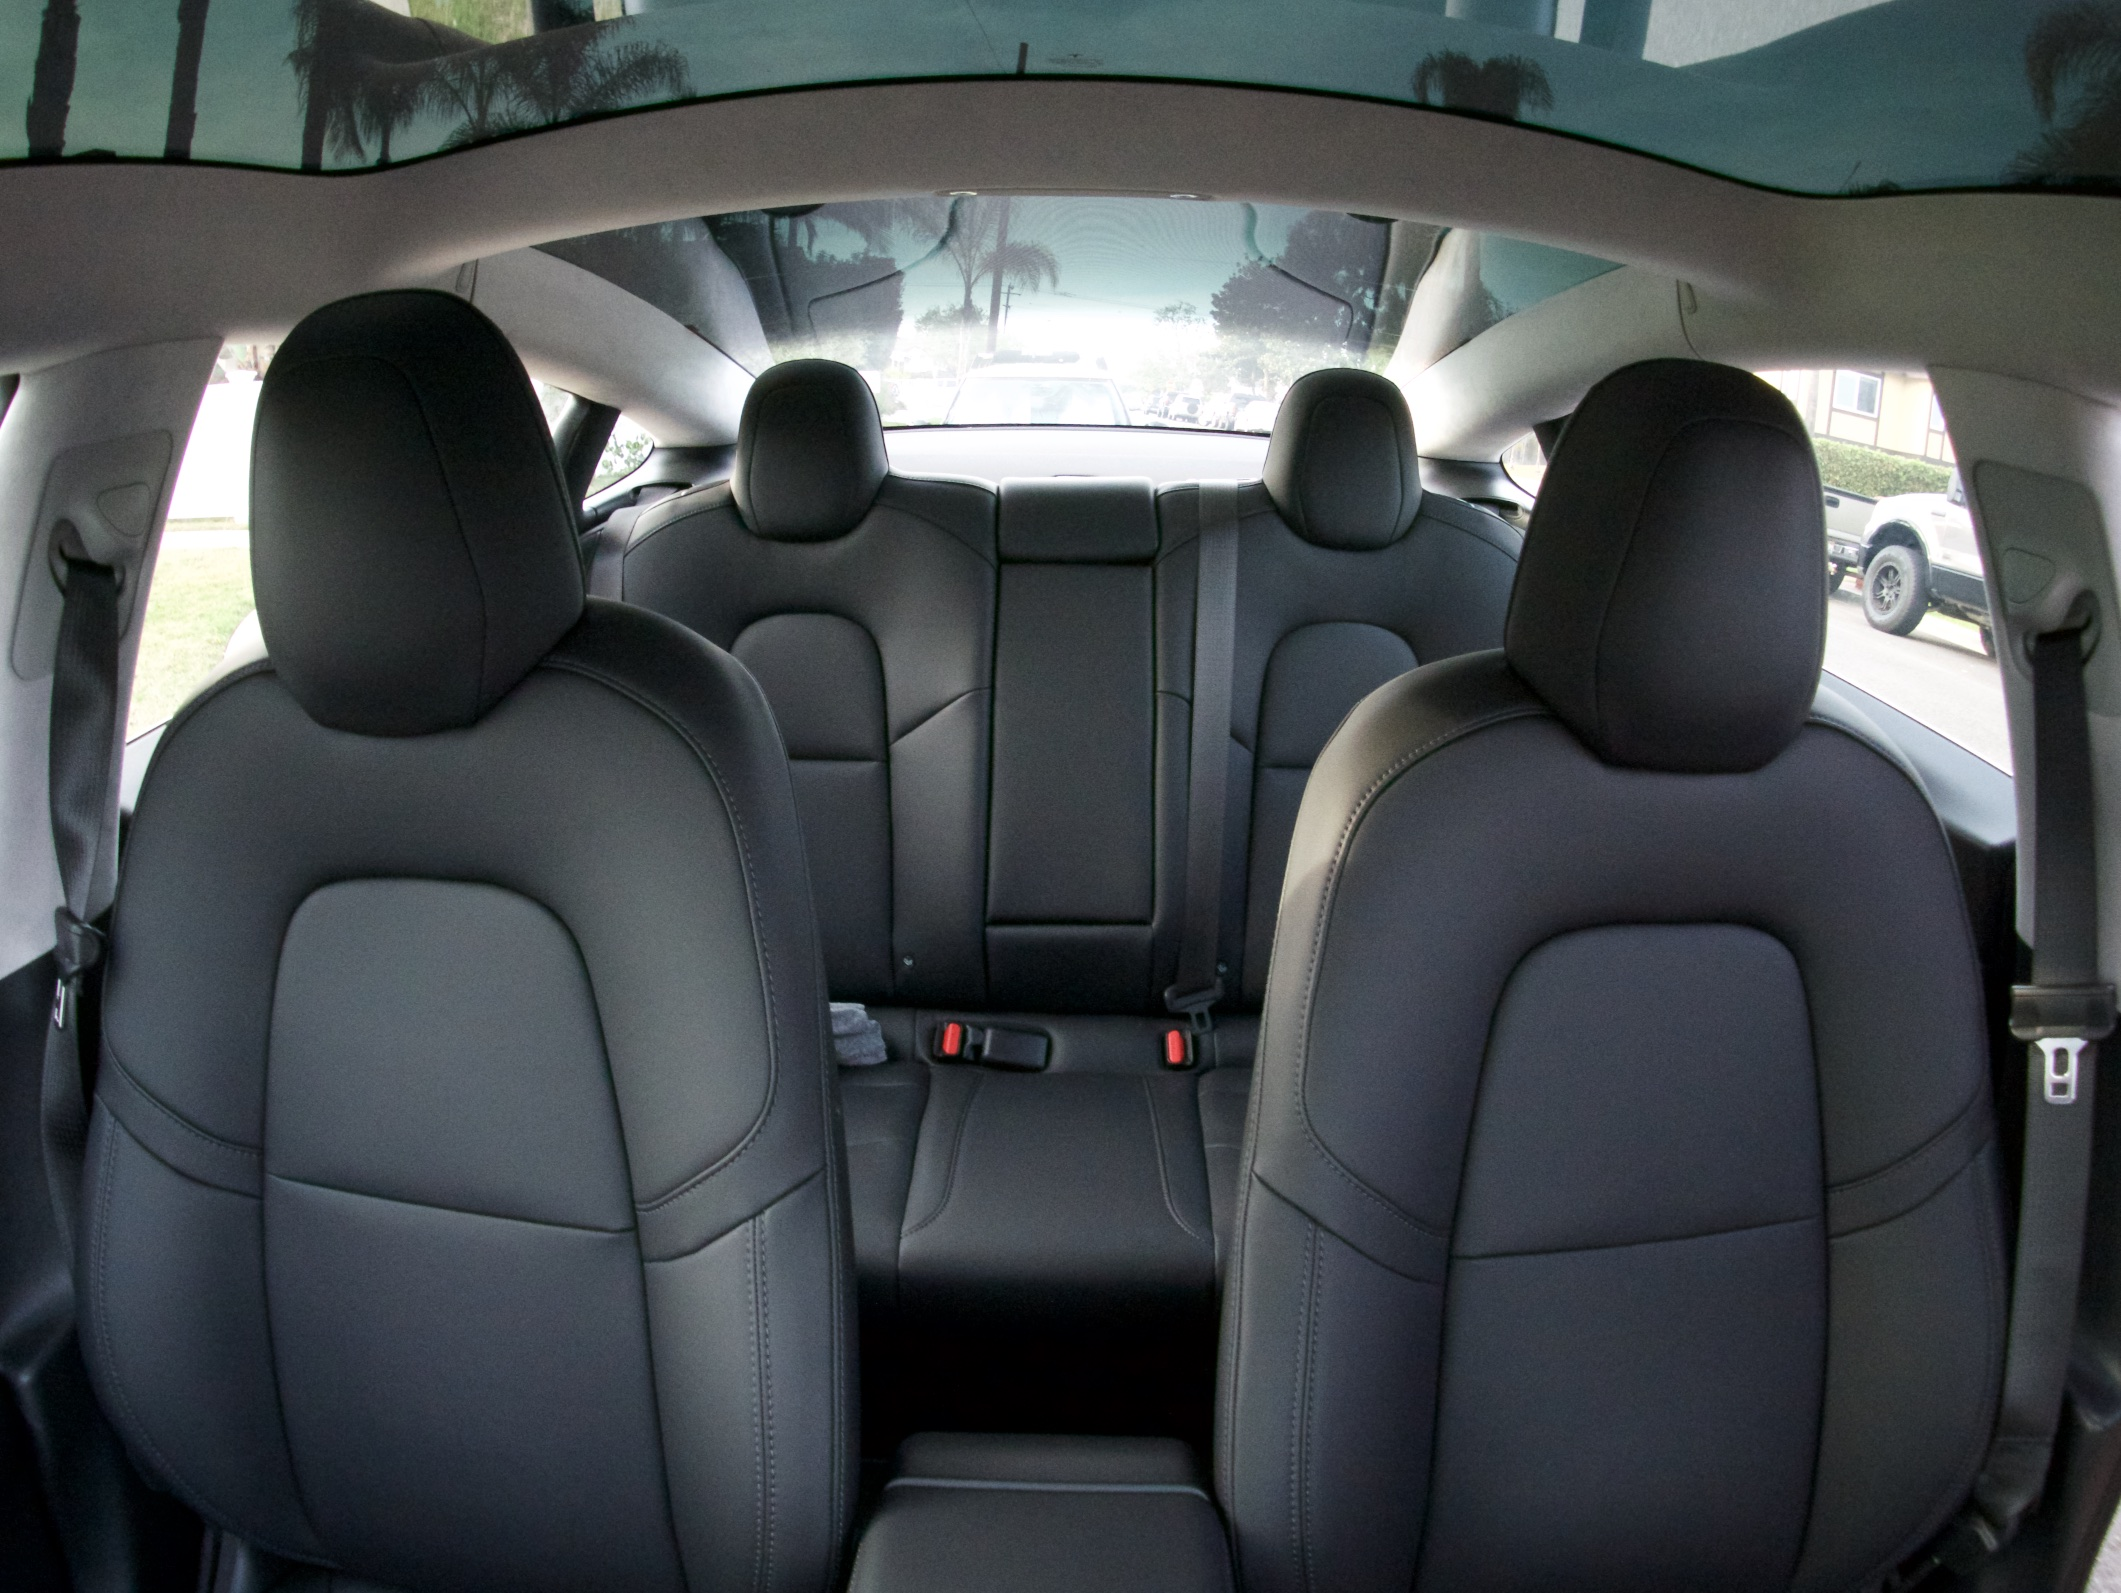 Tesla Model 3 seats